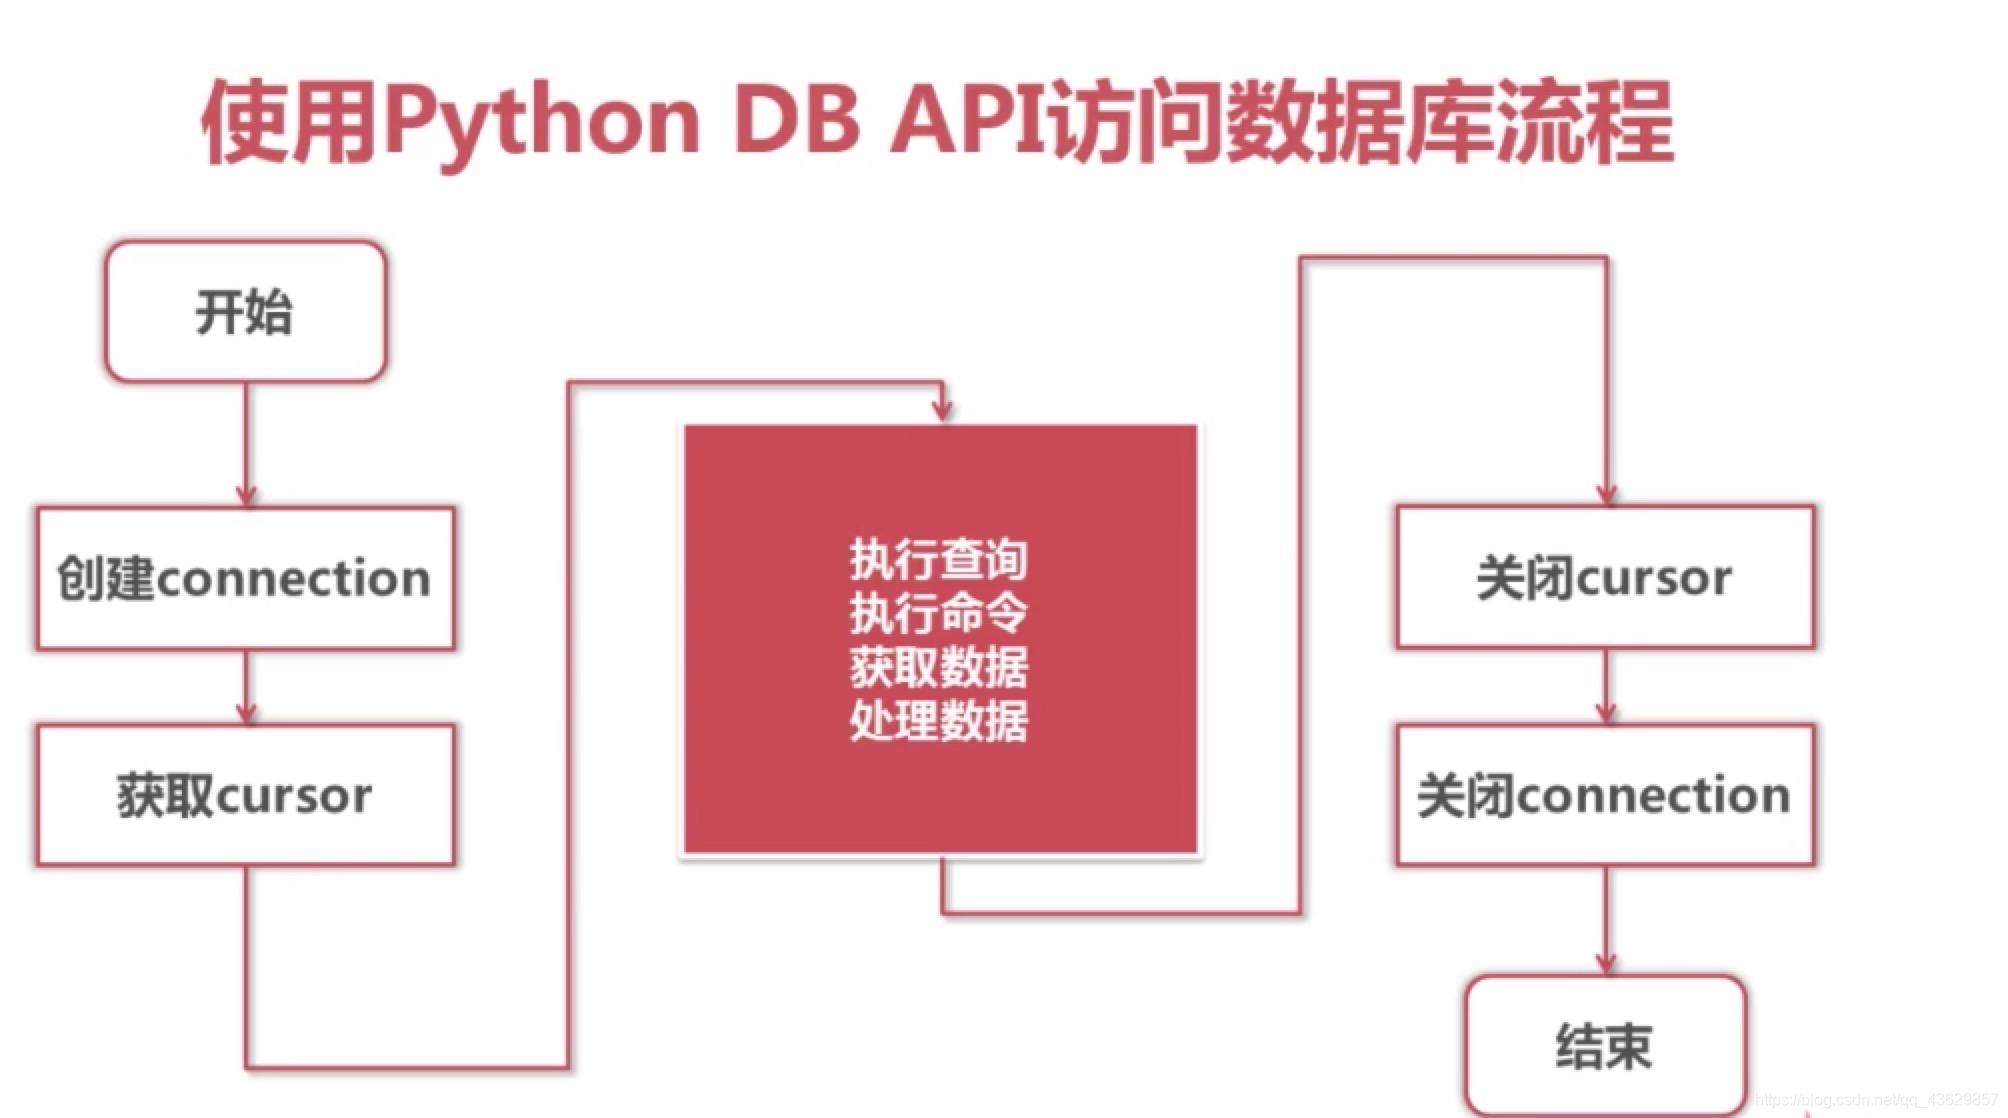 Python DB API访问数据库流程